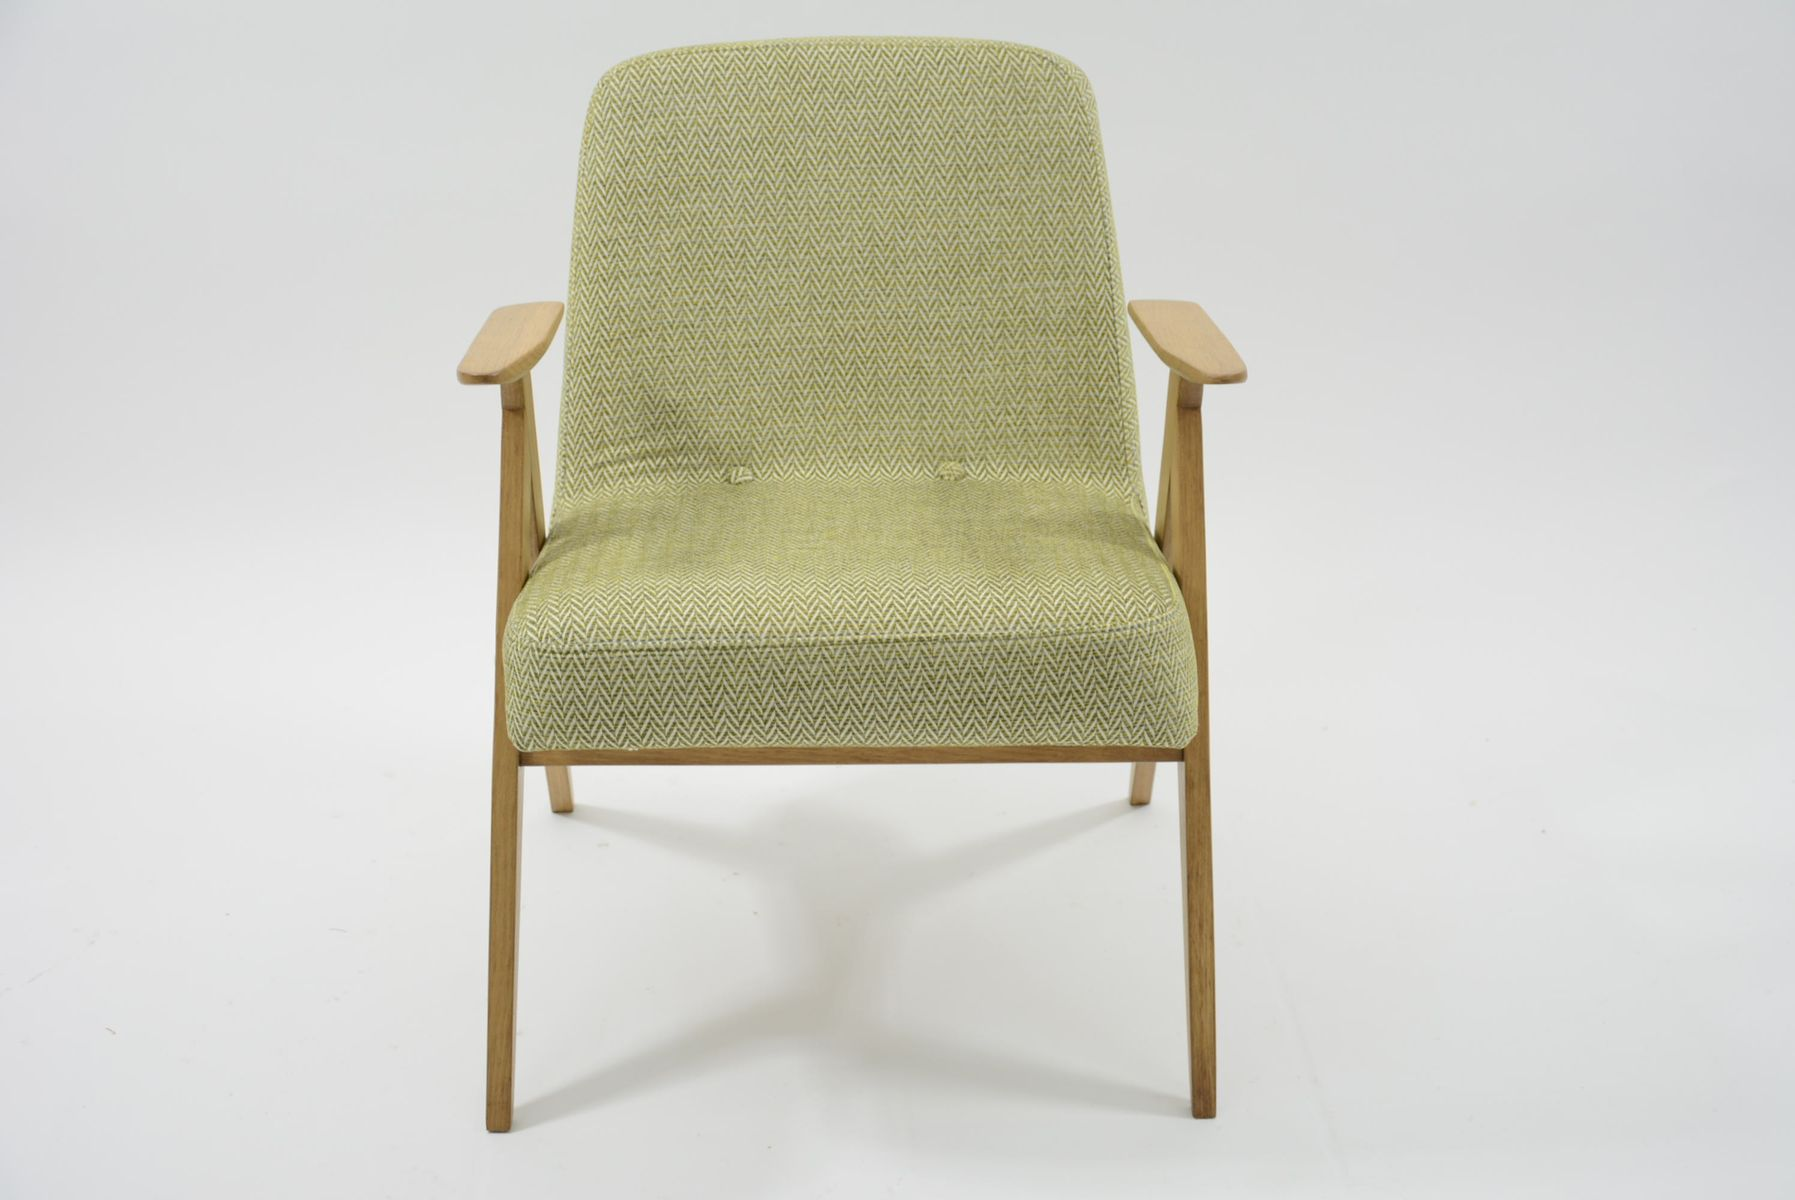 Zitronengelber Vintage Sessel, 1960er